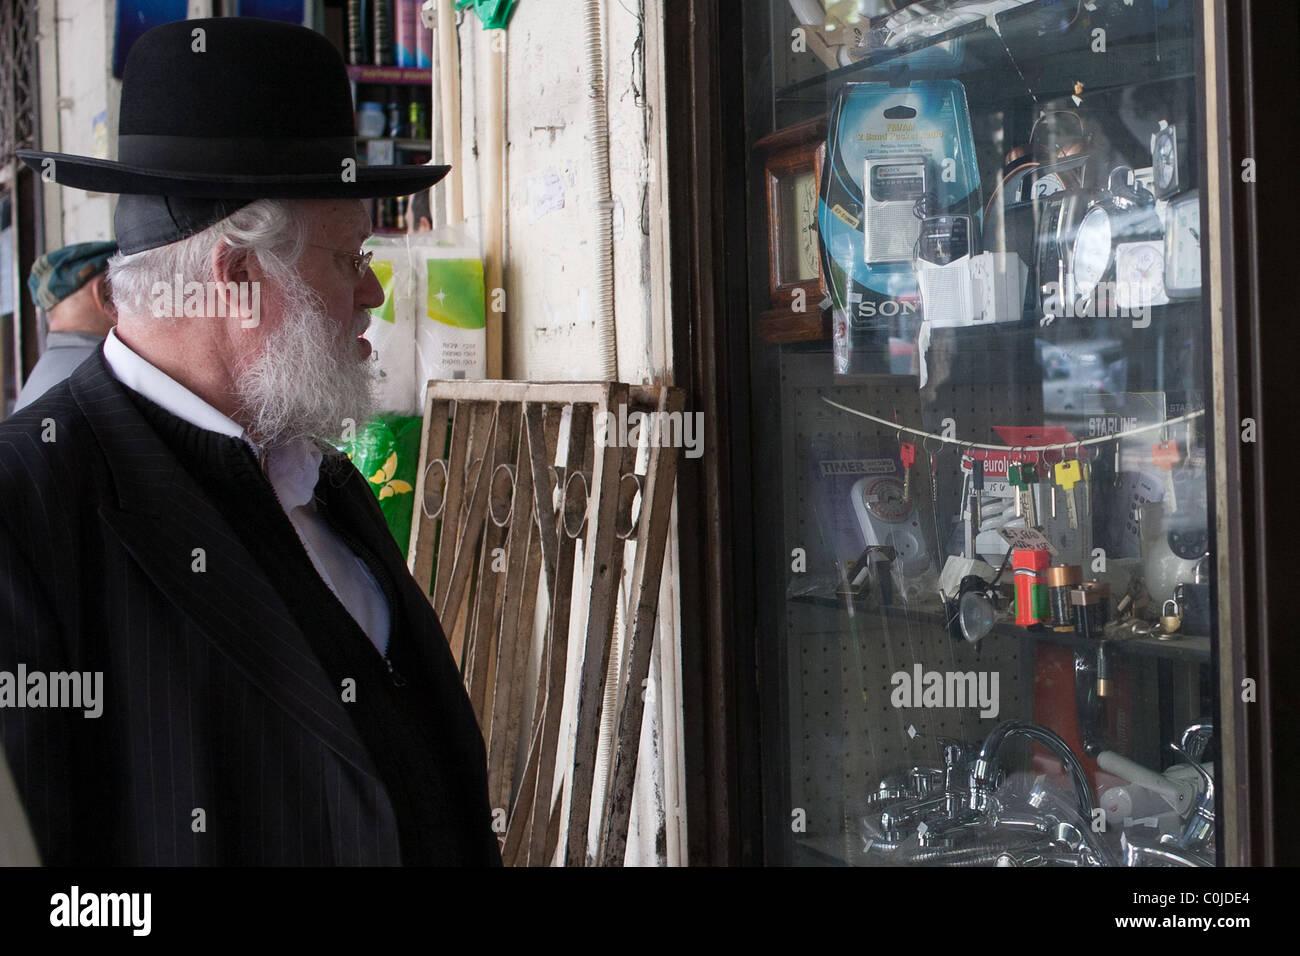 Ultra-Orthodox Haredi Jew window shopping - Stock Image